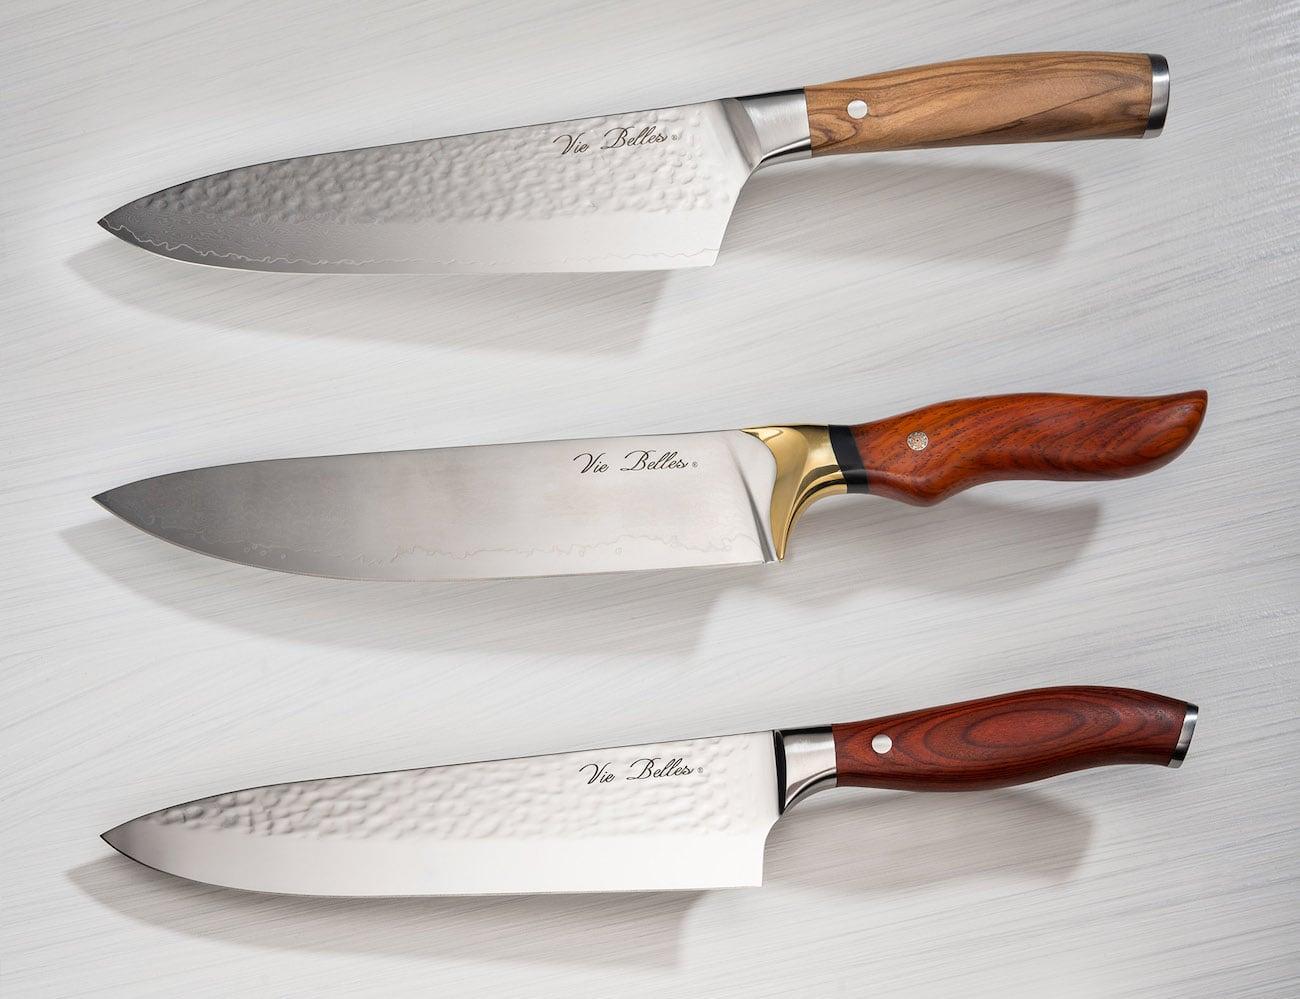 kitchen knives direct 28 images kitchen knives direct japanese knives direct reviews. Black Bedroom Furniture Sets. Home Design Ideas